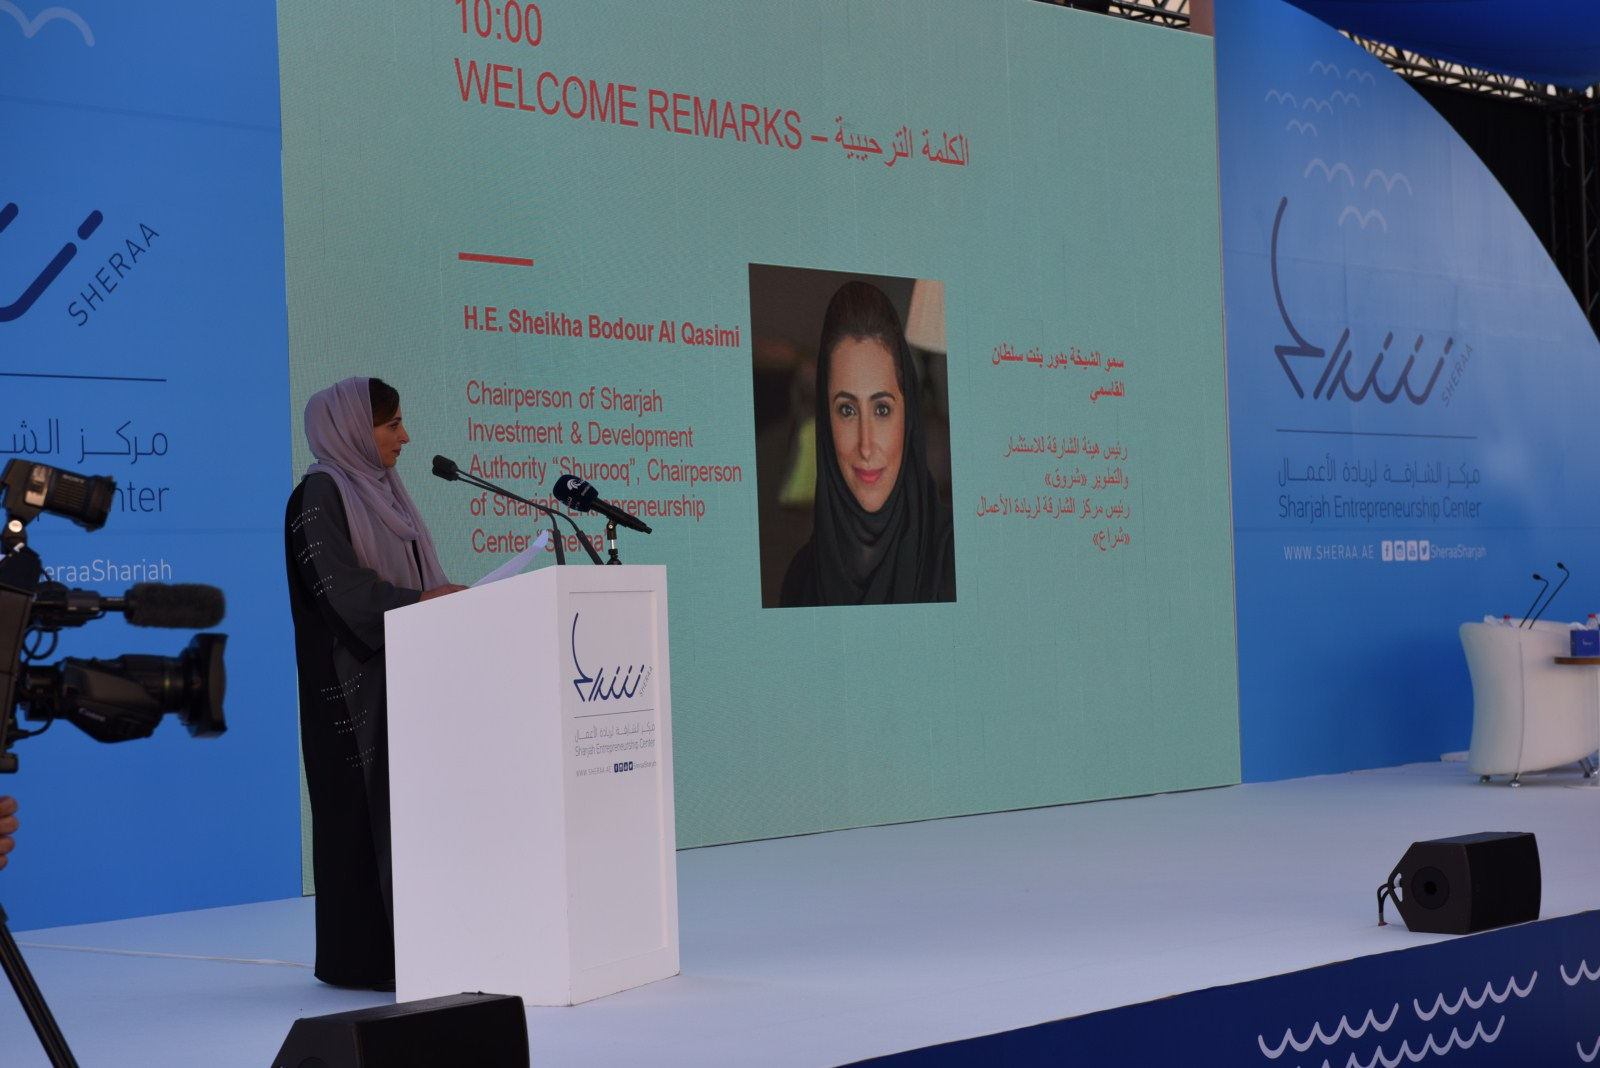 American_University_of_Sharjah_6-1.jpg